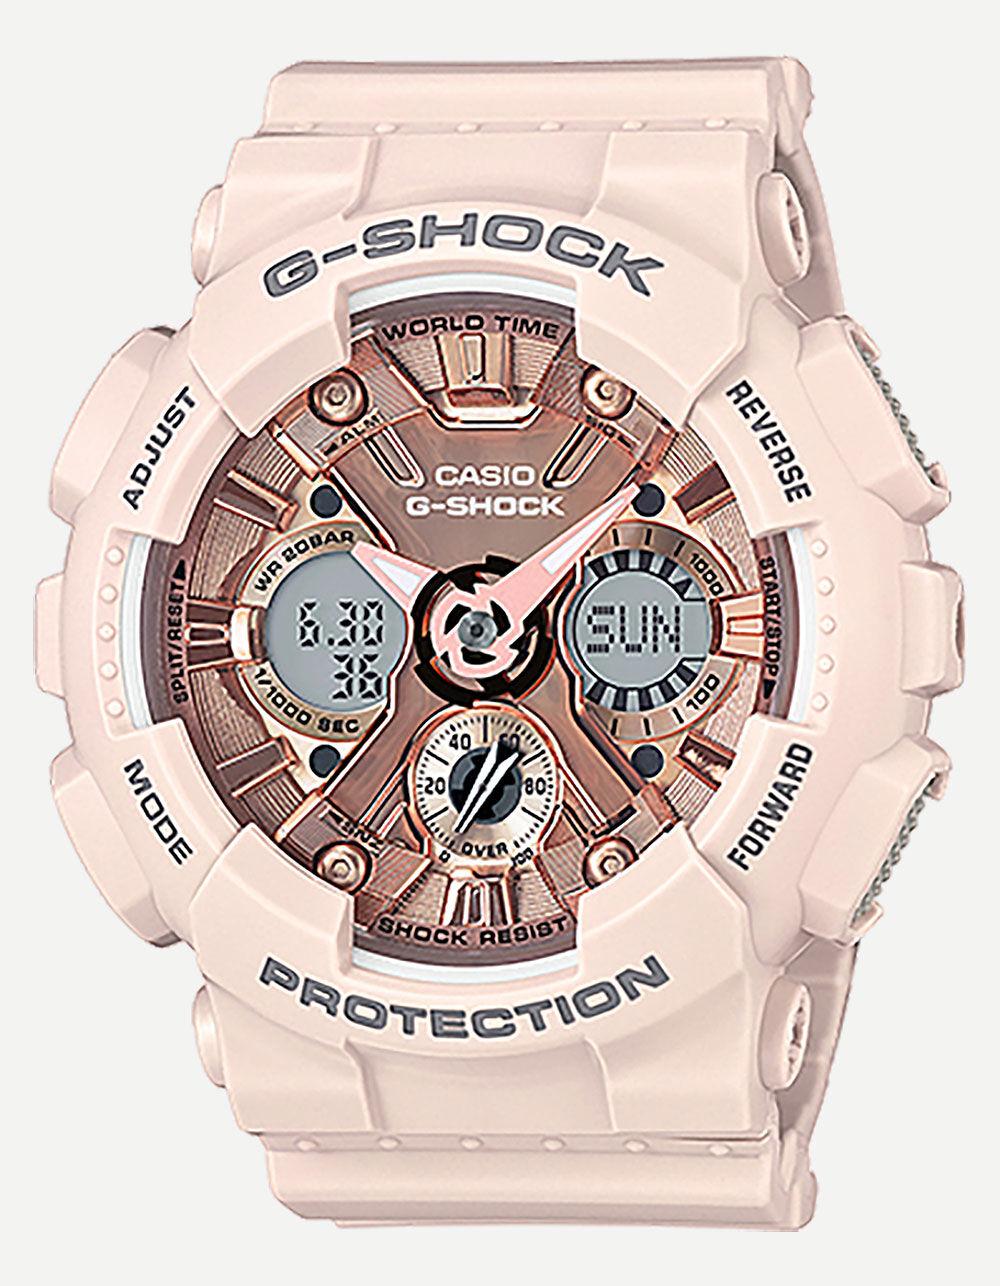 G-SHOCK GMA-S120MF-4A Watch